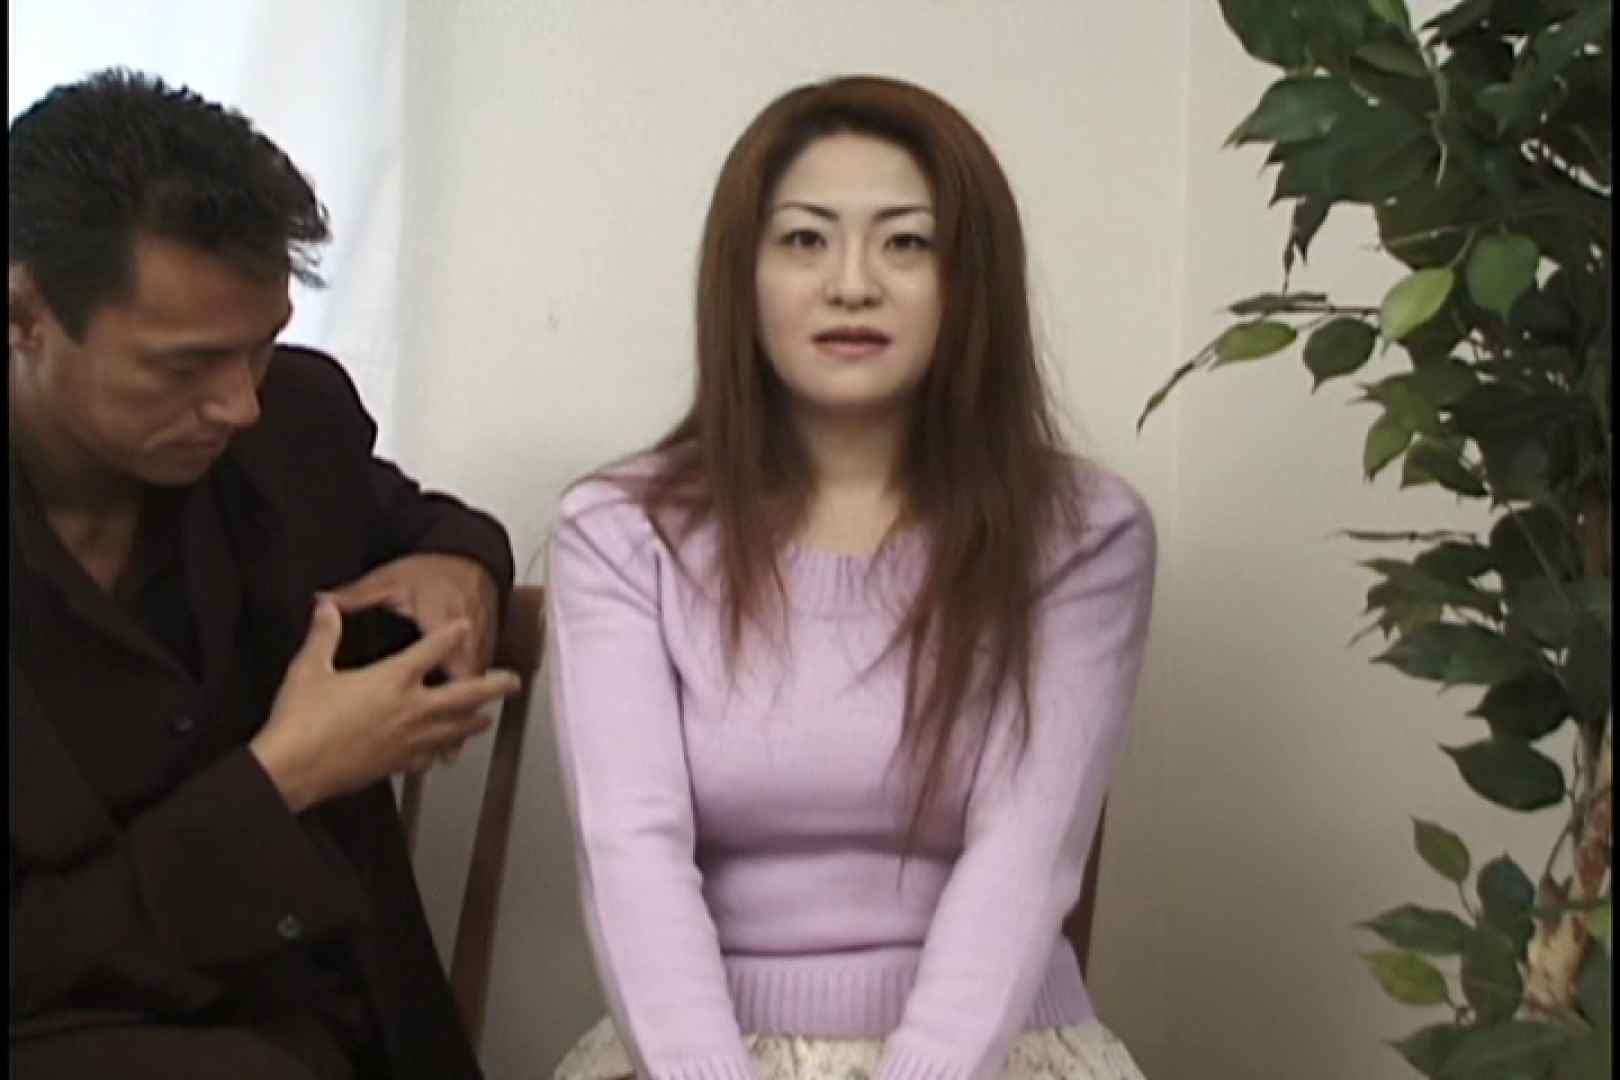 昼間の奥様は欲求不満 ~青井祐子~ 熟女  43連発 6